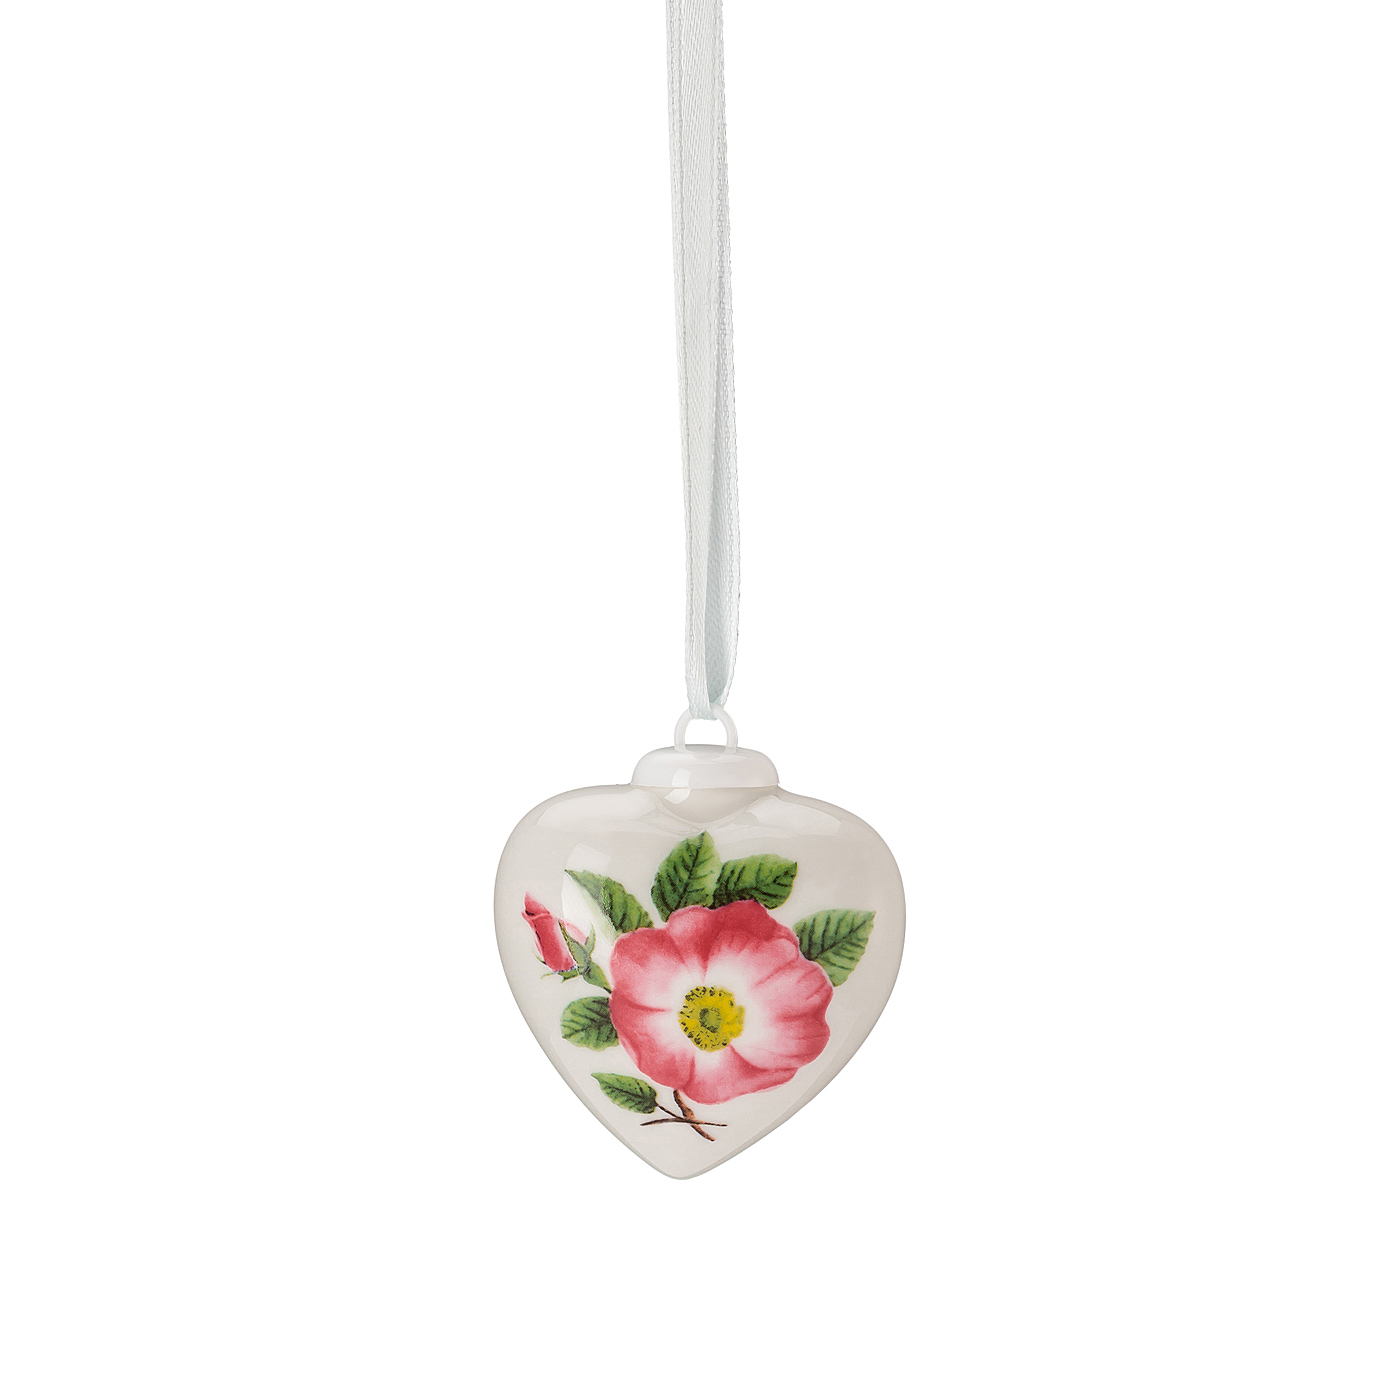 Porzellan-Mini-Herz Frühlingsgrüsse Heckenrose - pink Hutschenreuther